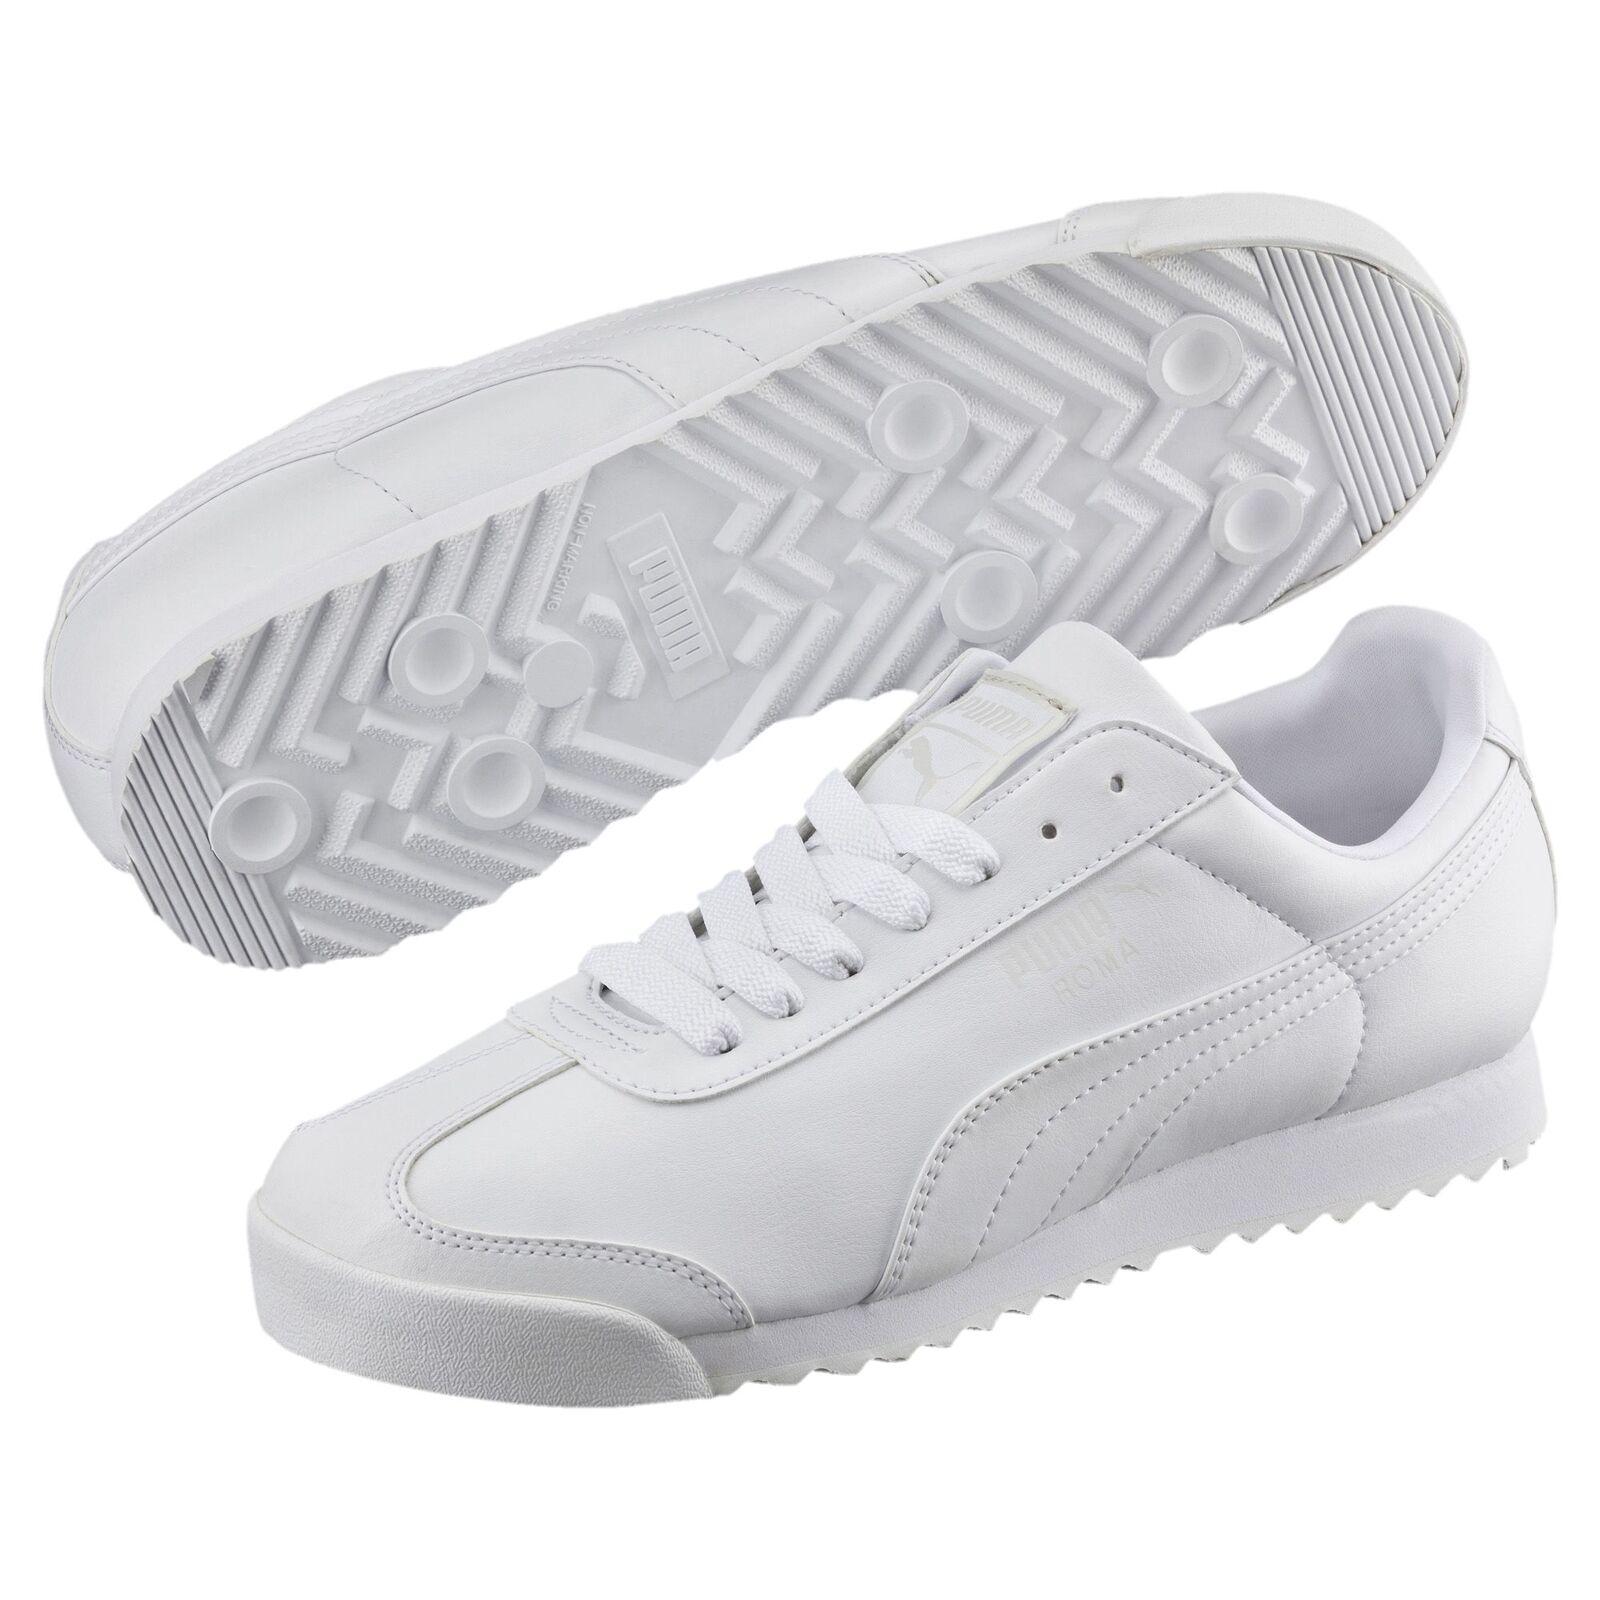 Puma Roma Basic Triple Negro  Corriendo Hombre Corriendo  Walking casuales zapatos  Zapatillas  353572-17 d71a43